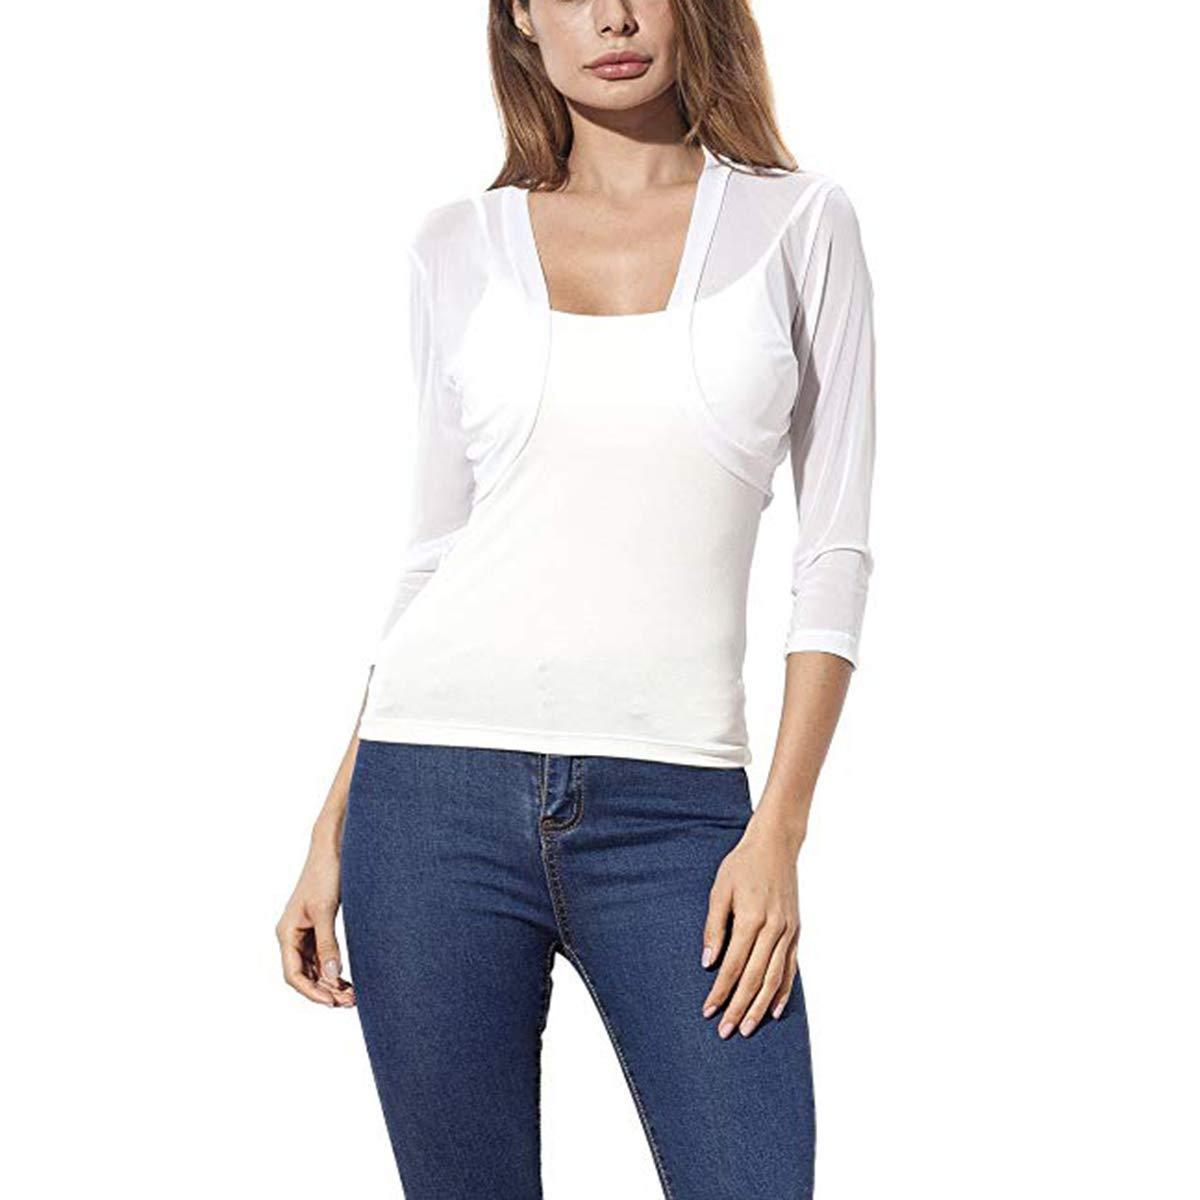 bc121c925ce907 Get Quotations · oboss Women Shrugs Summer Floral Lace/Sheer Chiffon Shrug  Short Sleeve Open Front Bolero Cardigan